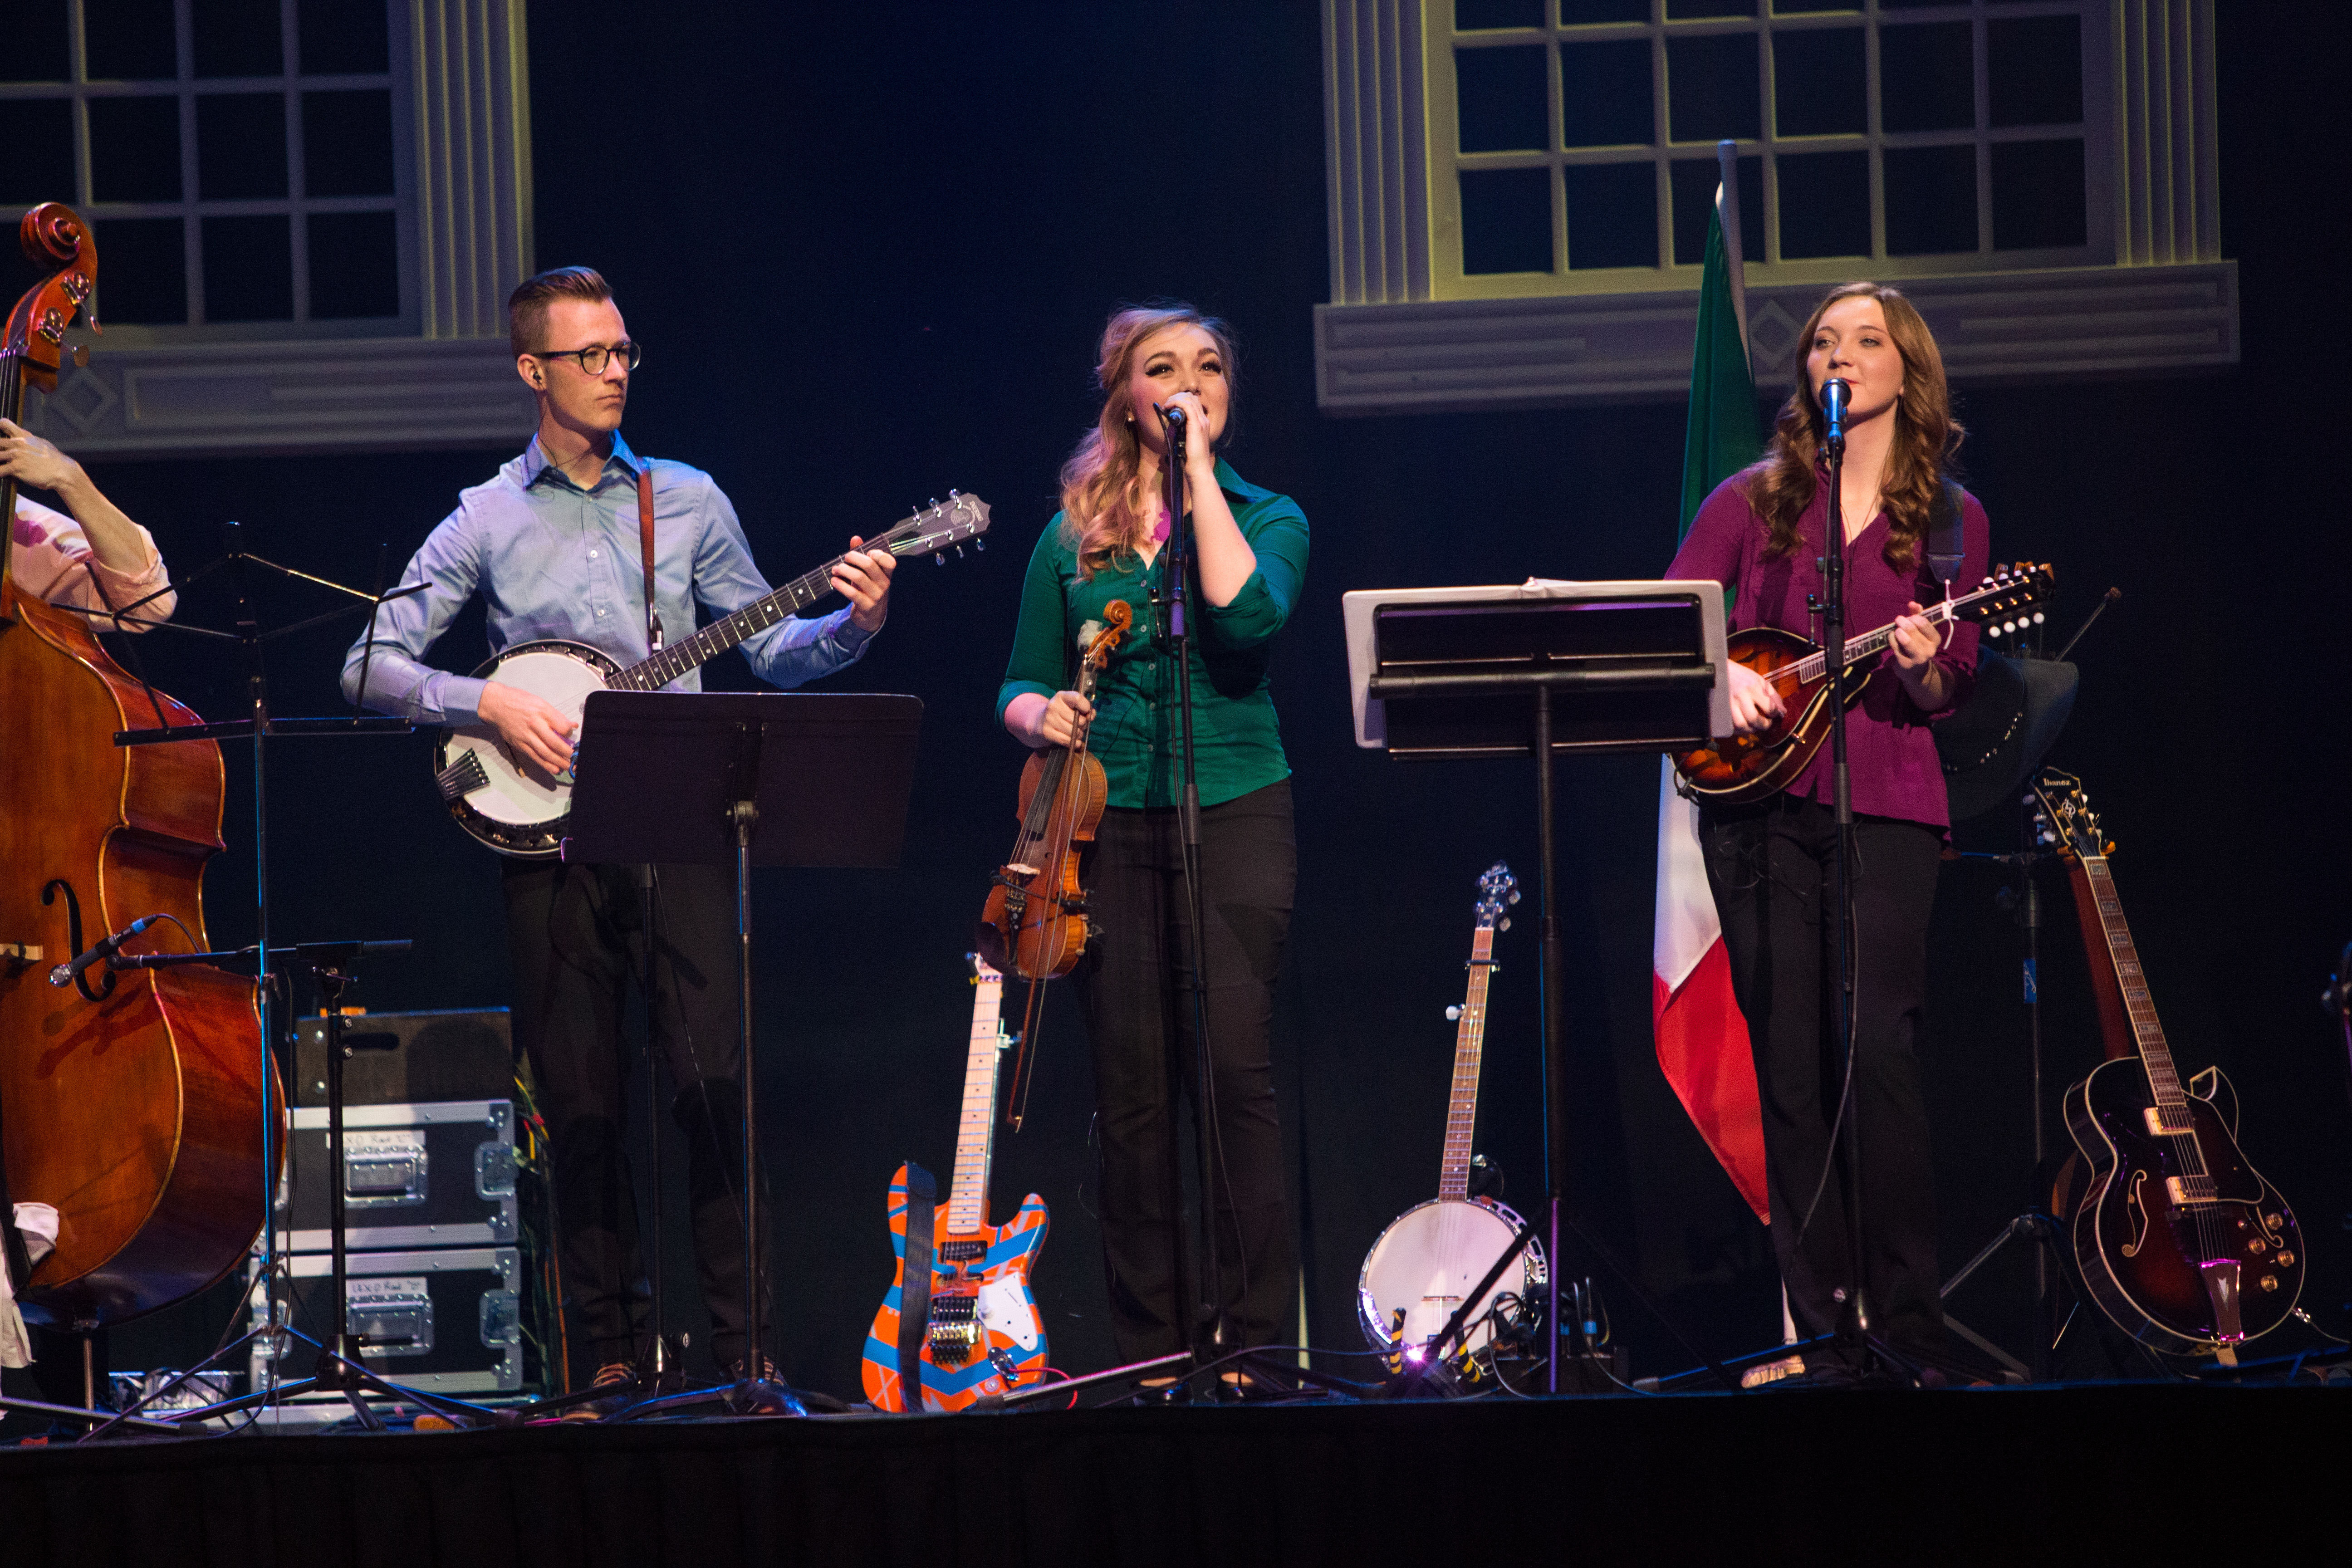 Isaac Gelison , Grace Dayton, Auriana Mann all performing.